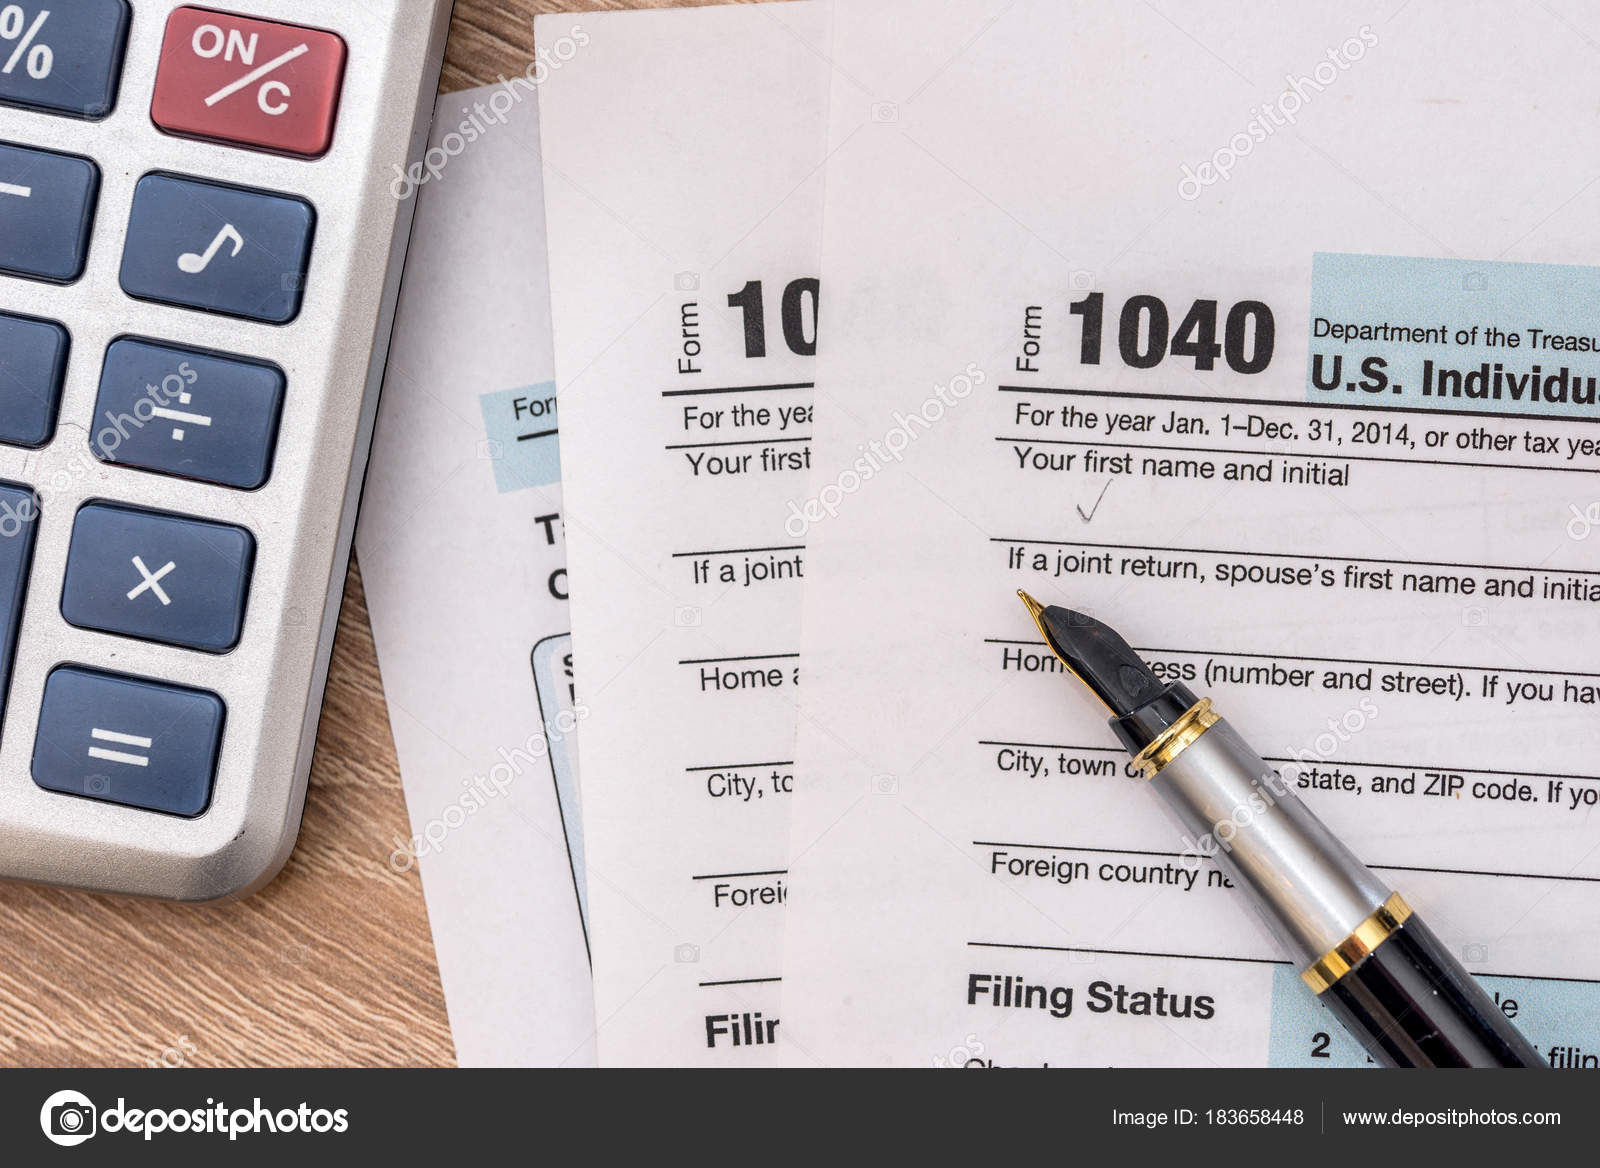 form 1040 calculator  12 Year Tax Form 12 Calculator Pen — Stock Photo ...